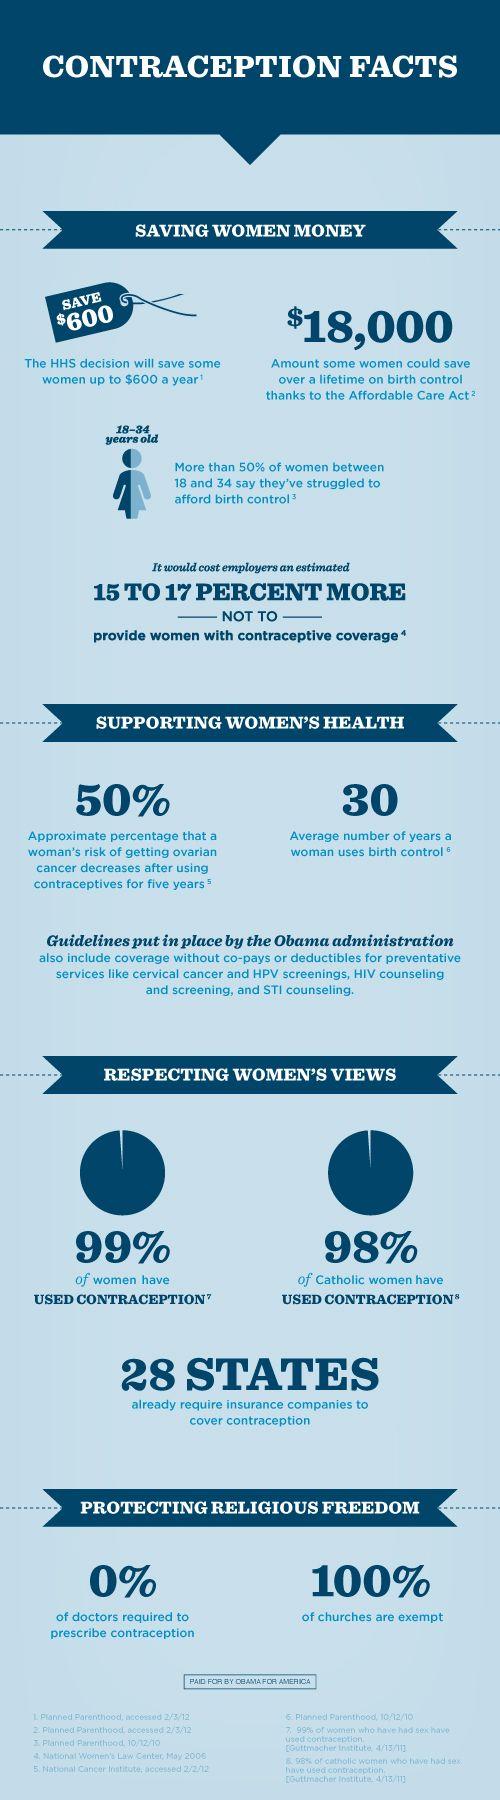 Contraception Facts: Womens Health, Women'S Health, Health Care, Births Control, Contracept Coverage, U.S. Presidents, Women Health, Contracept Facts, Barack Obama